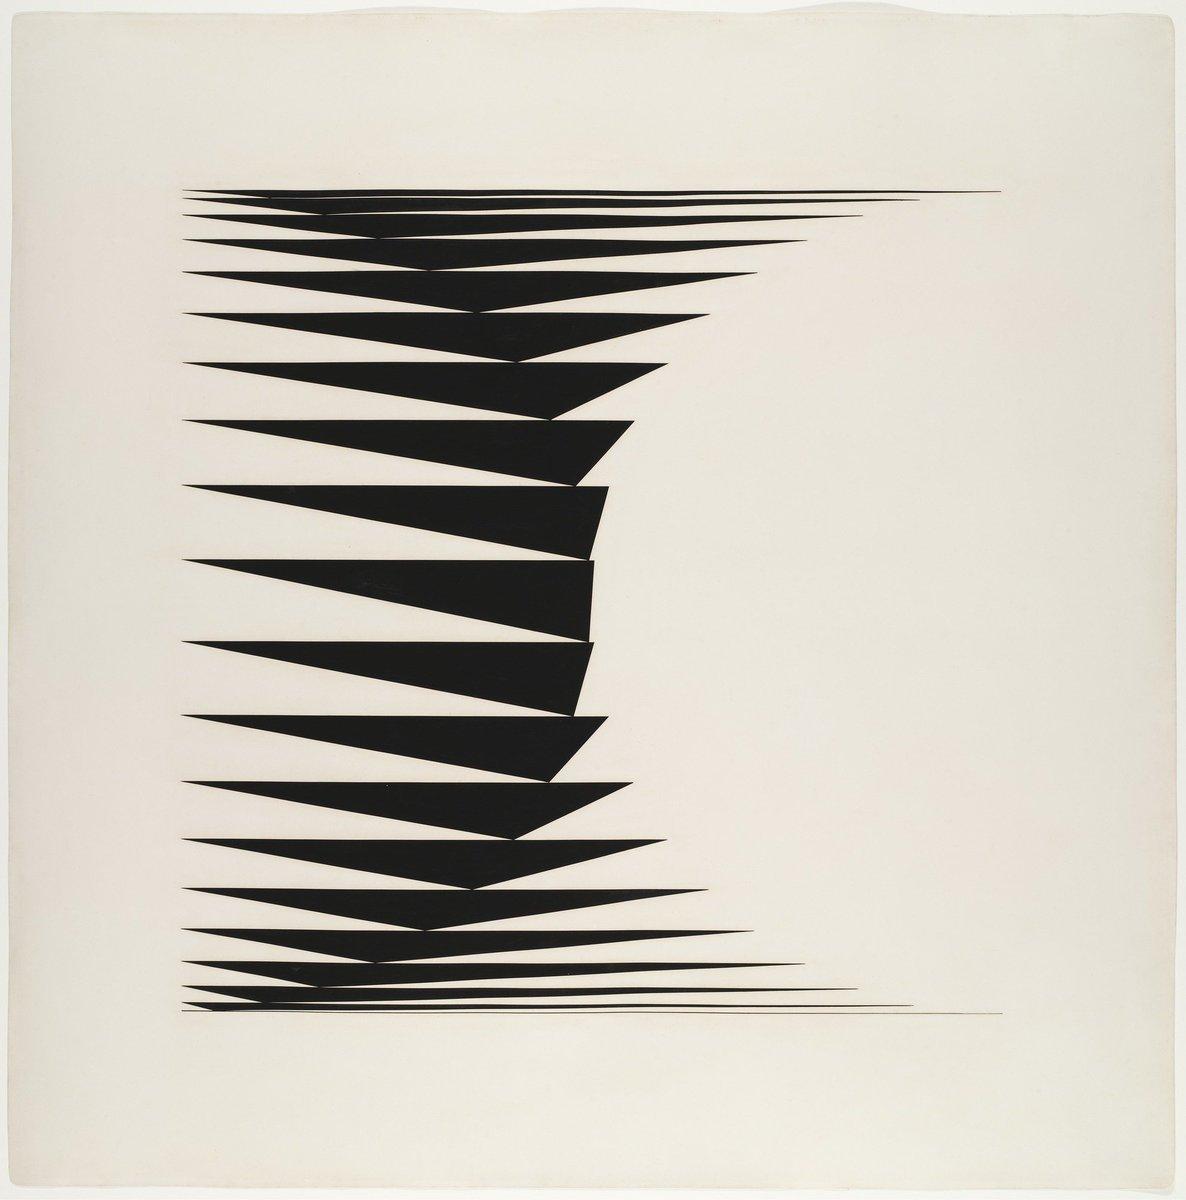 #drawings 1958 by Hércules Barsotti (Brazilian artist, 1914 – 2010)